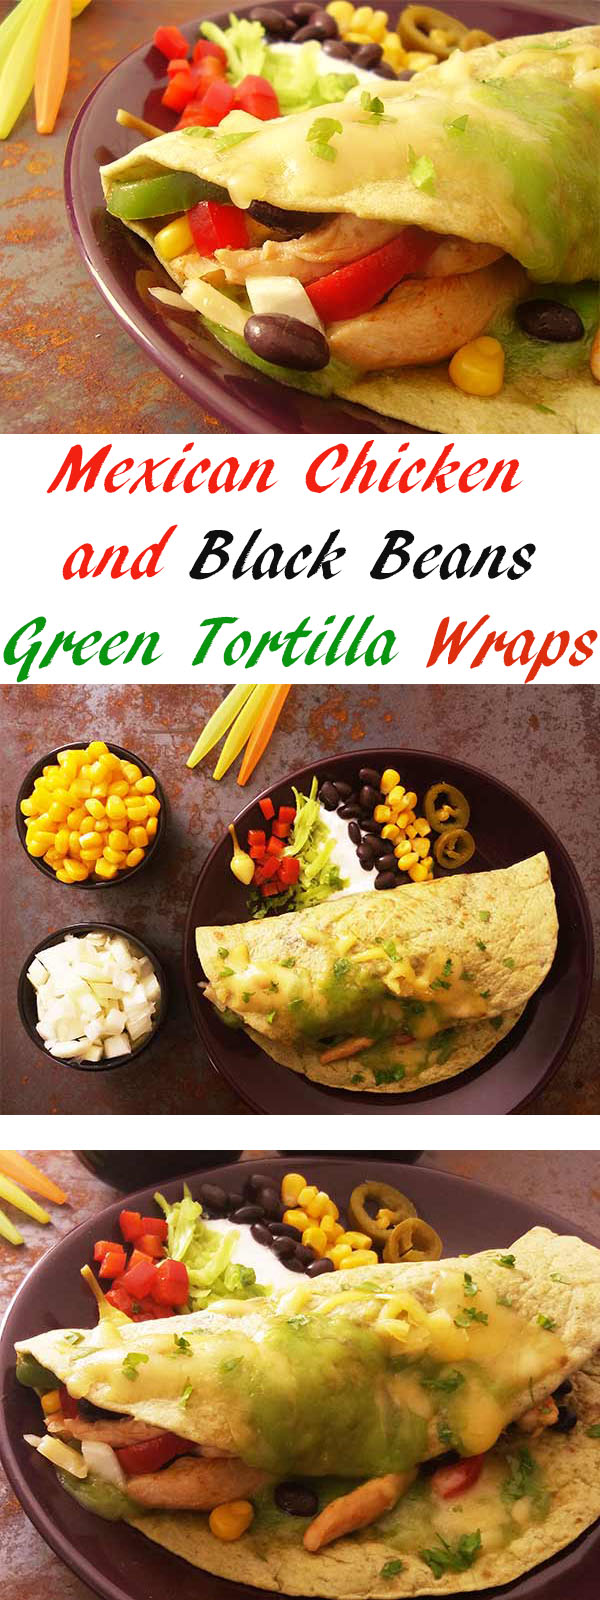 Mexican Chicken and Black Beans Green Tortilla Wraps : Cinco de Mayo delish made under 20 minutes.